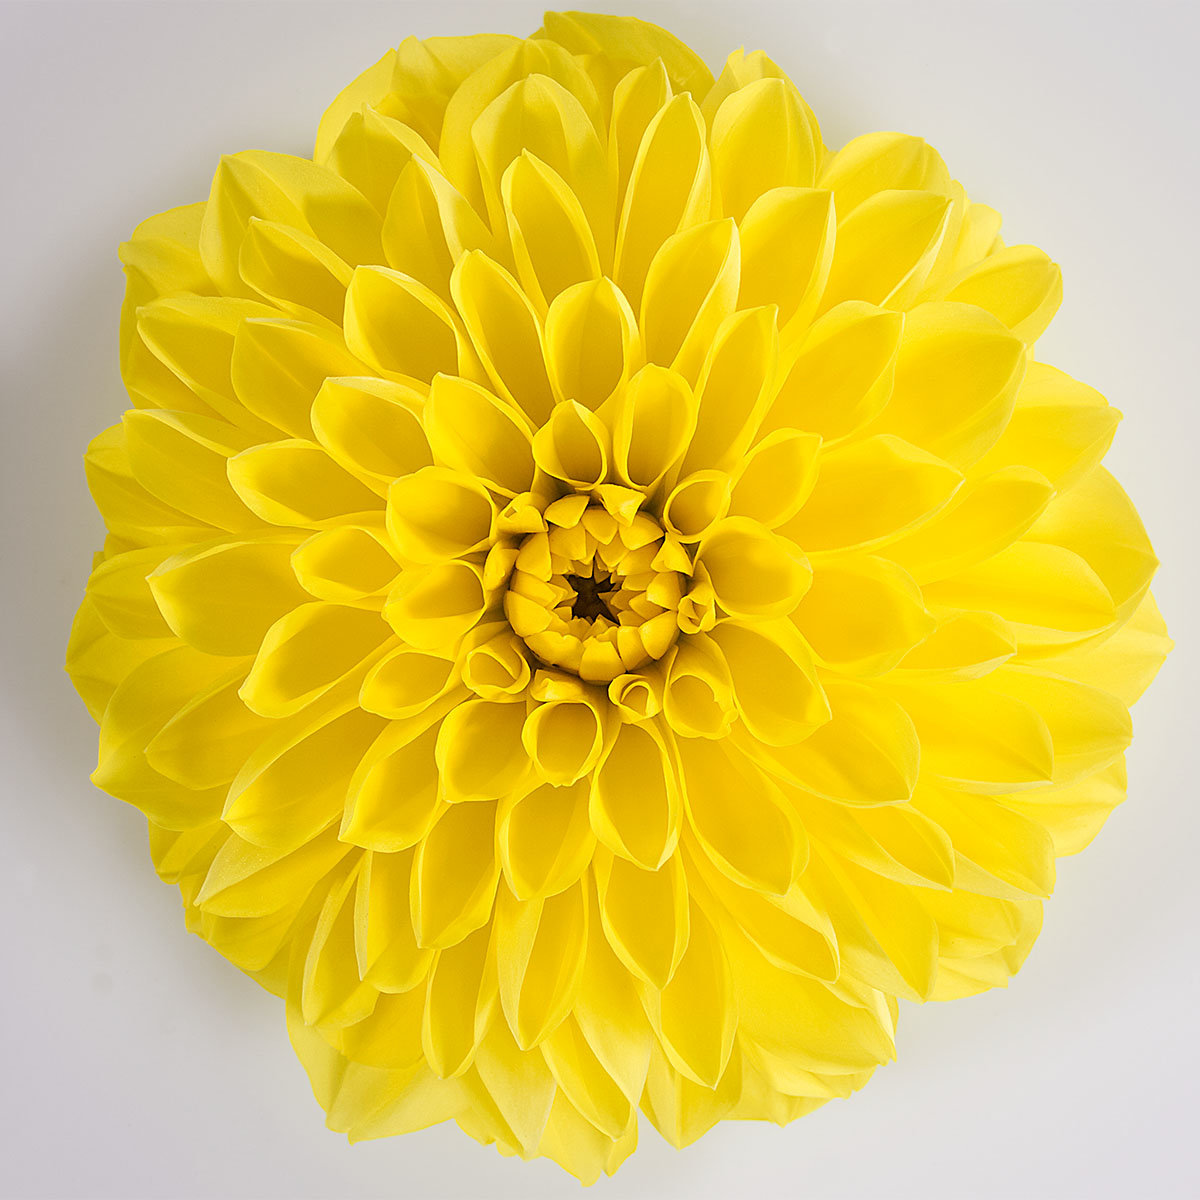 gelbe sommer dahlie xl qualit t von g rtner p tschke. Black Bedroom Furniture Sets. Home Design Ideas